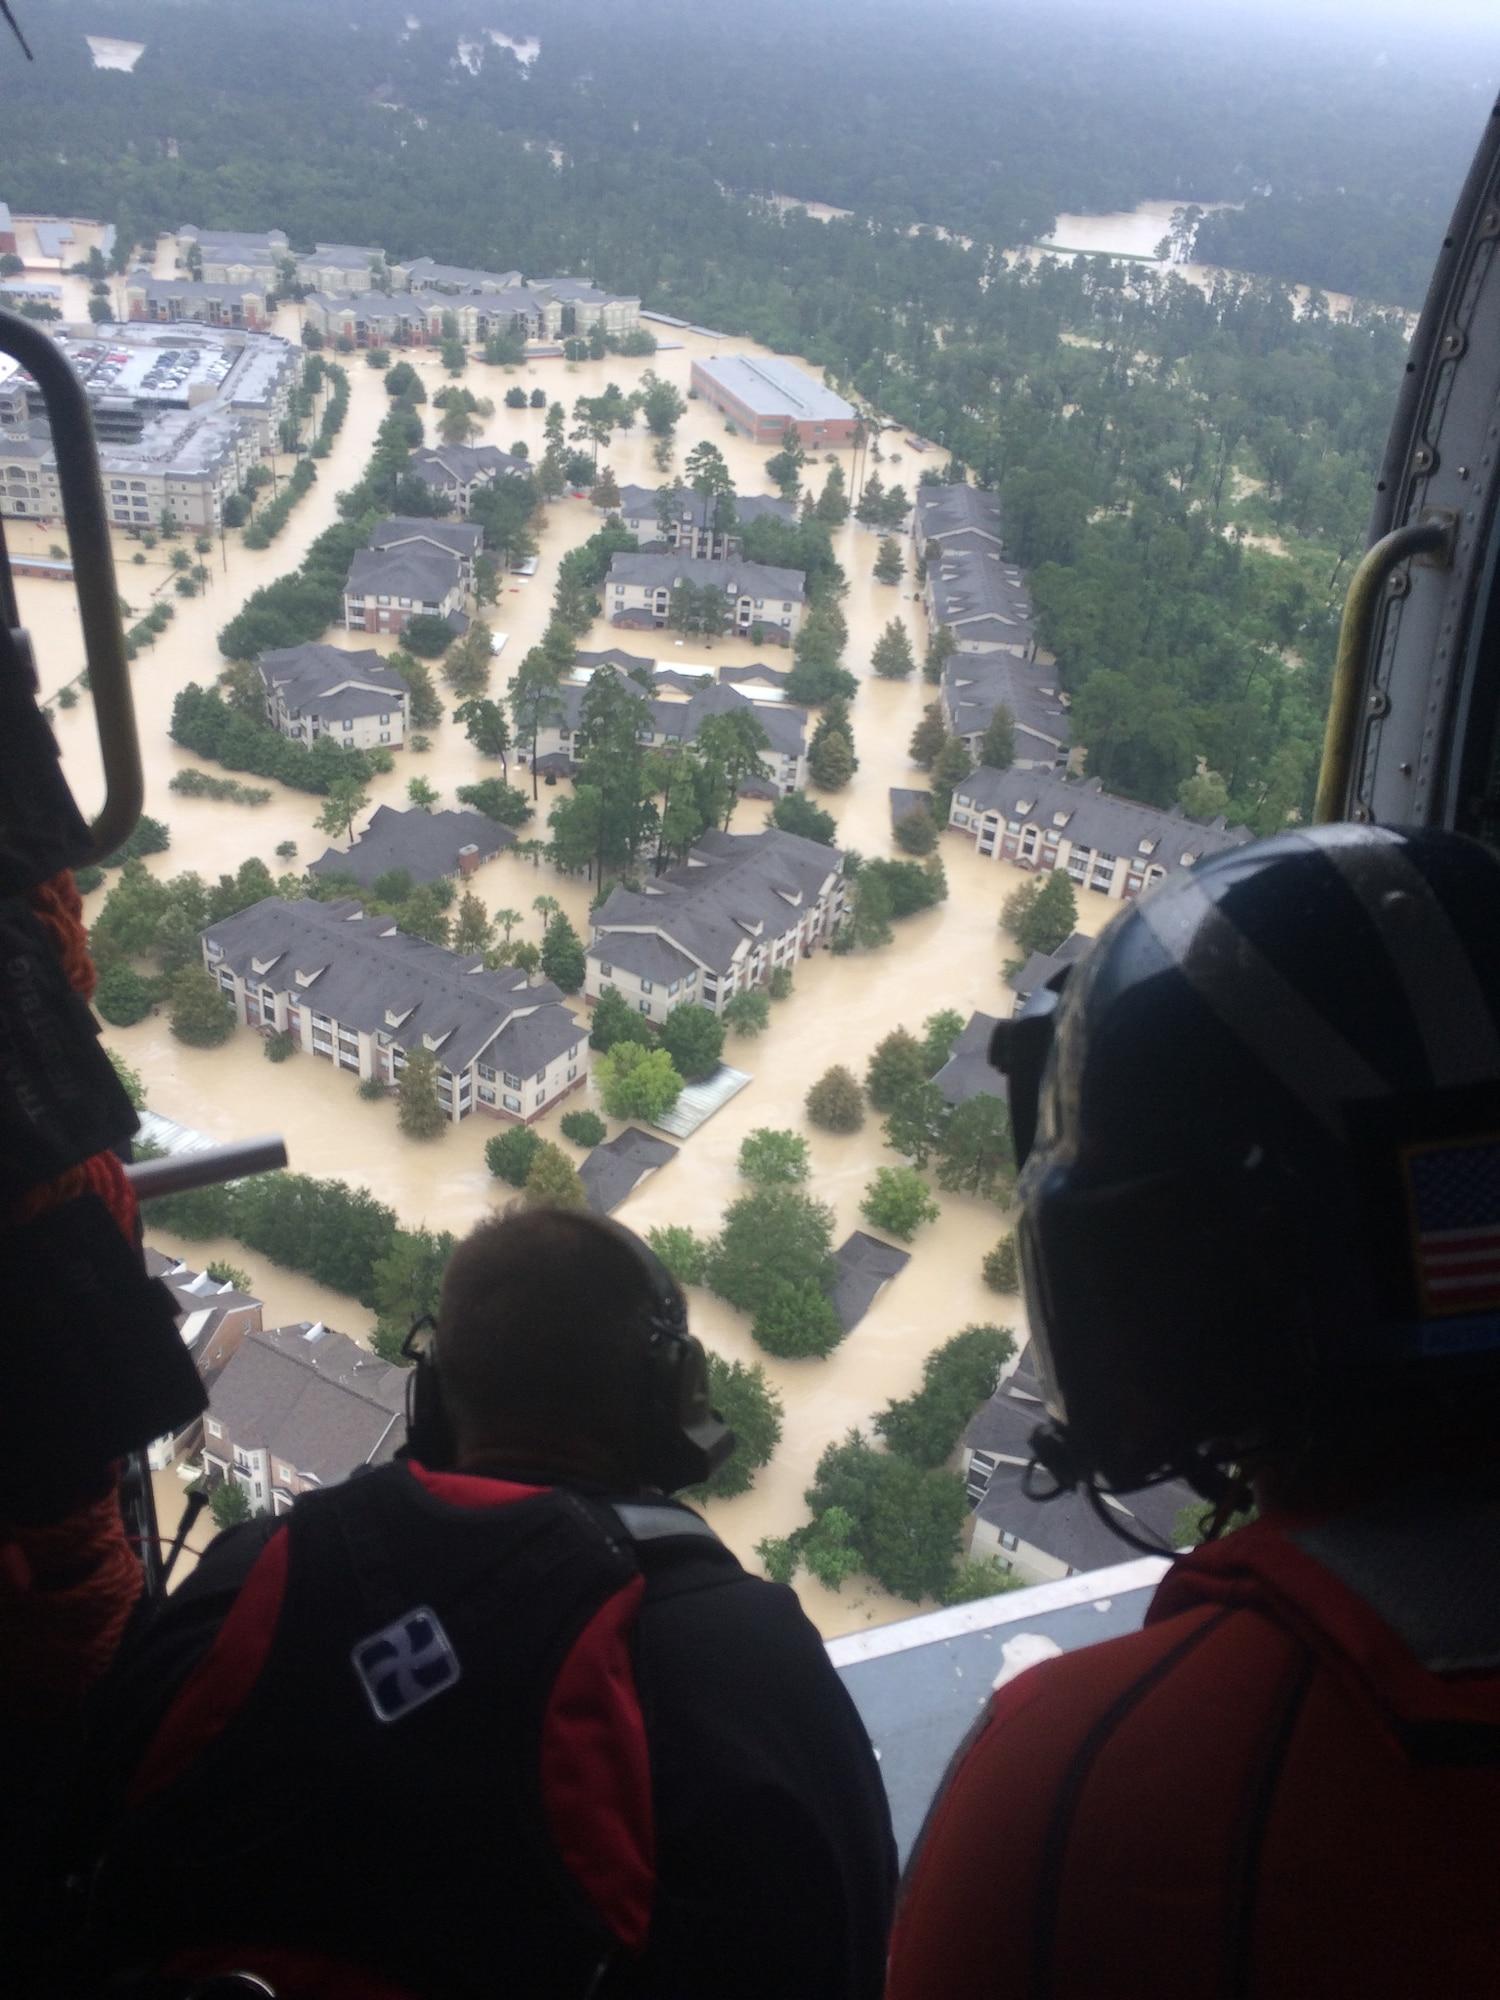 Kentucky Air Guardsmen deploy for Hurricane Harvey rescue operations